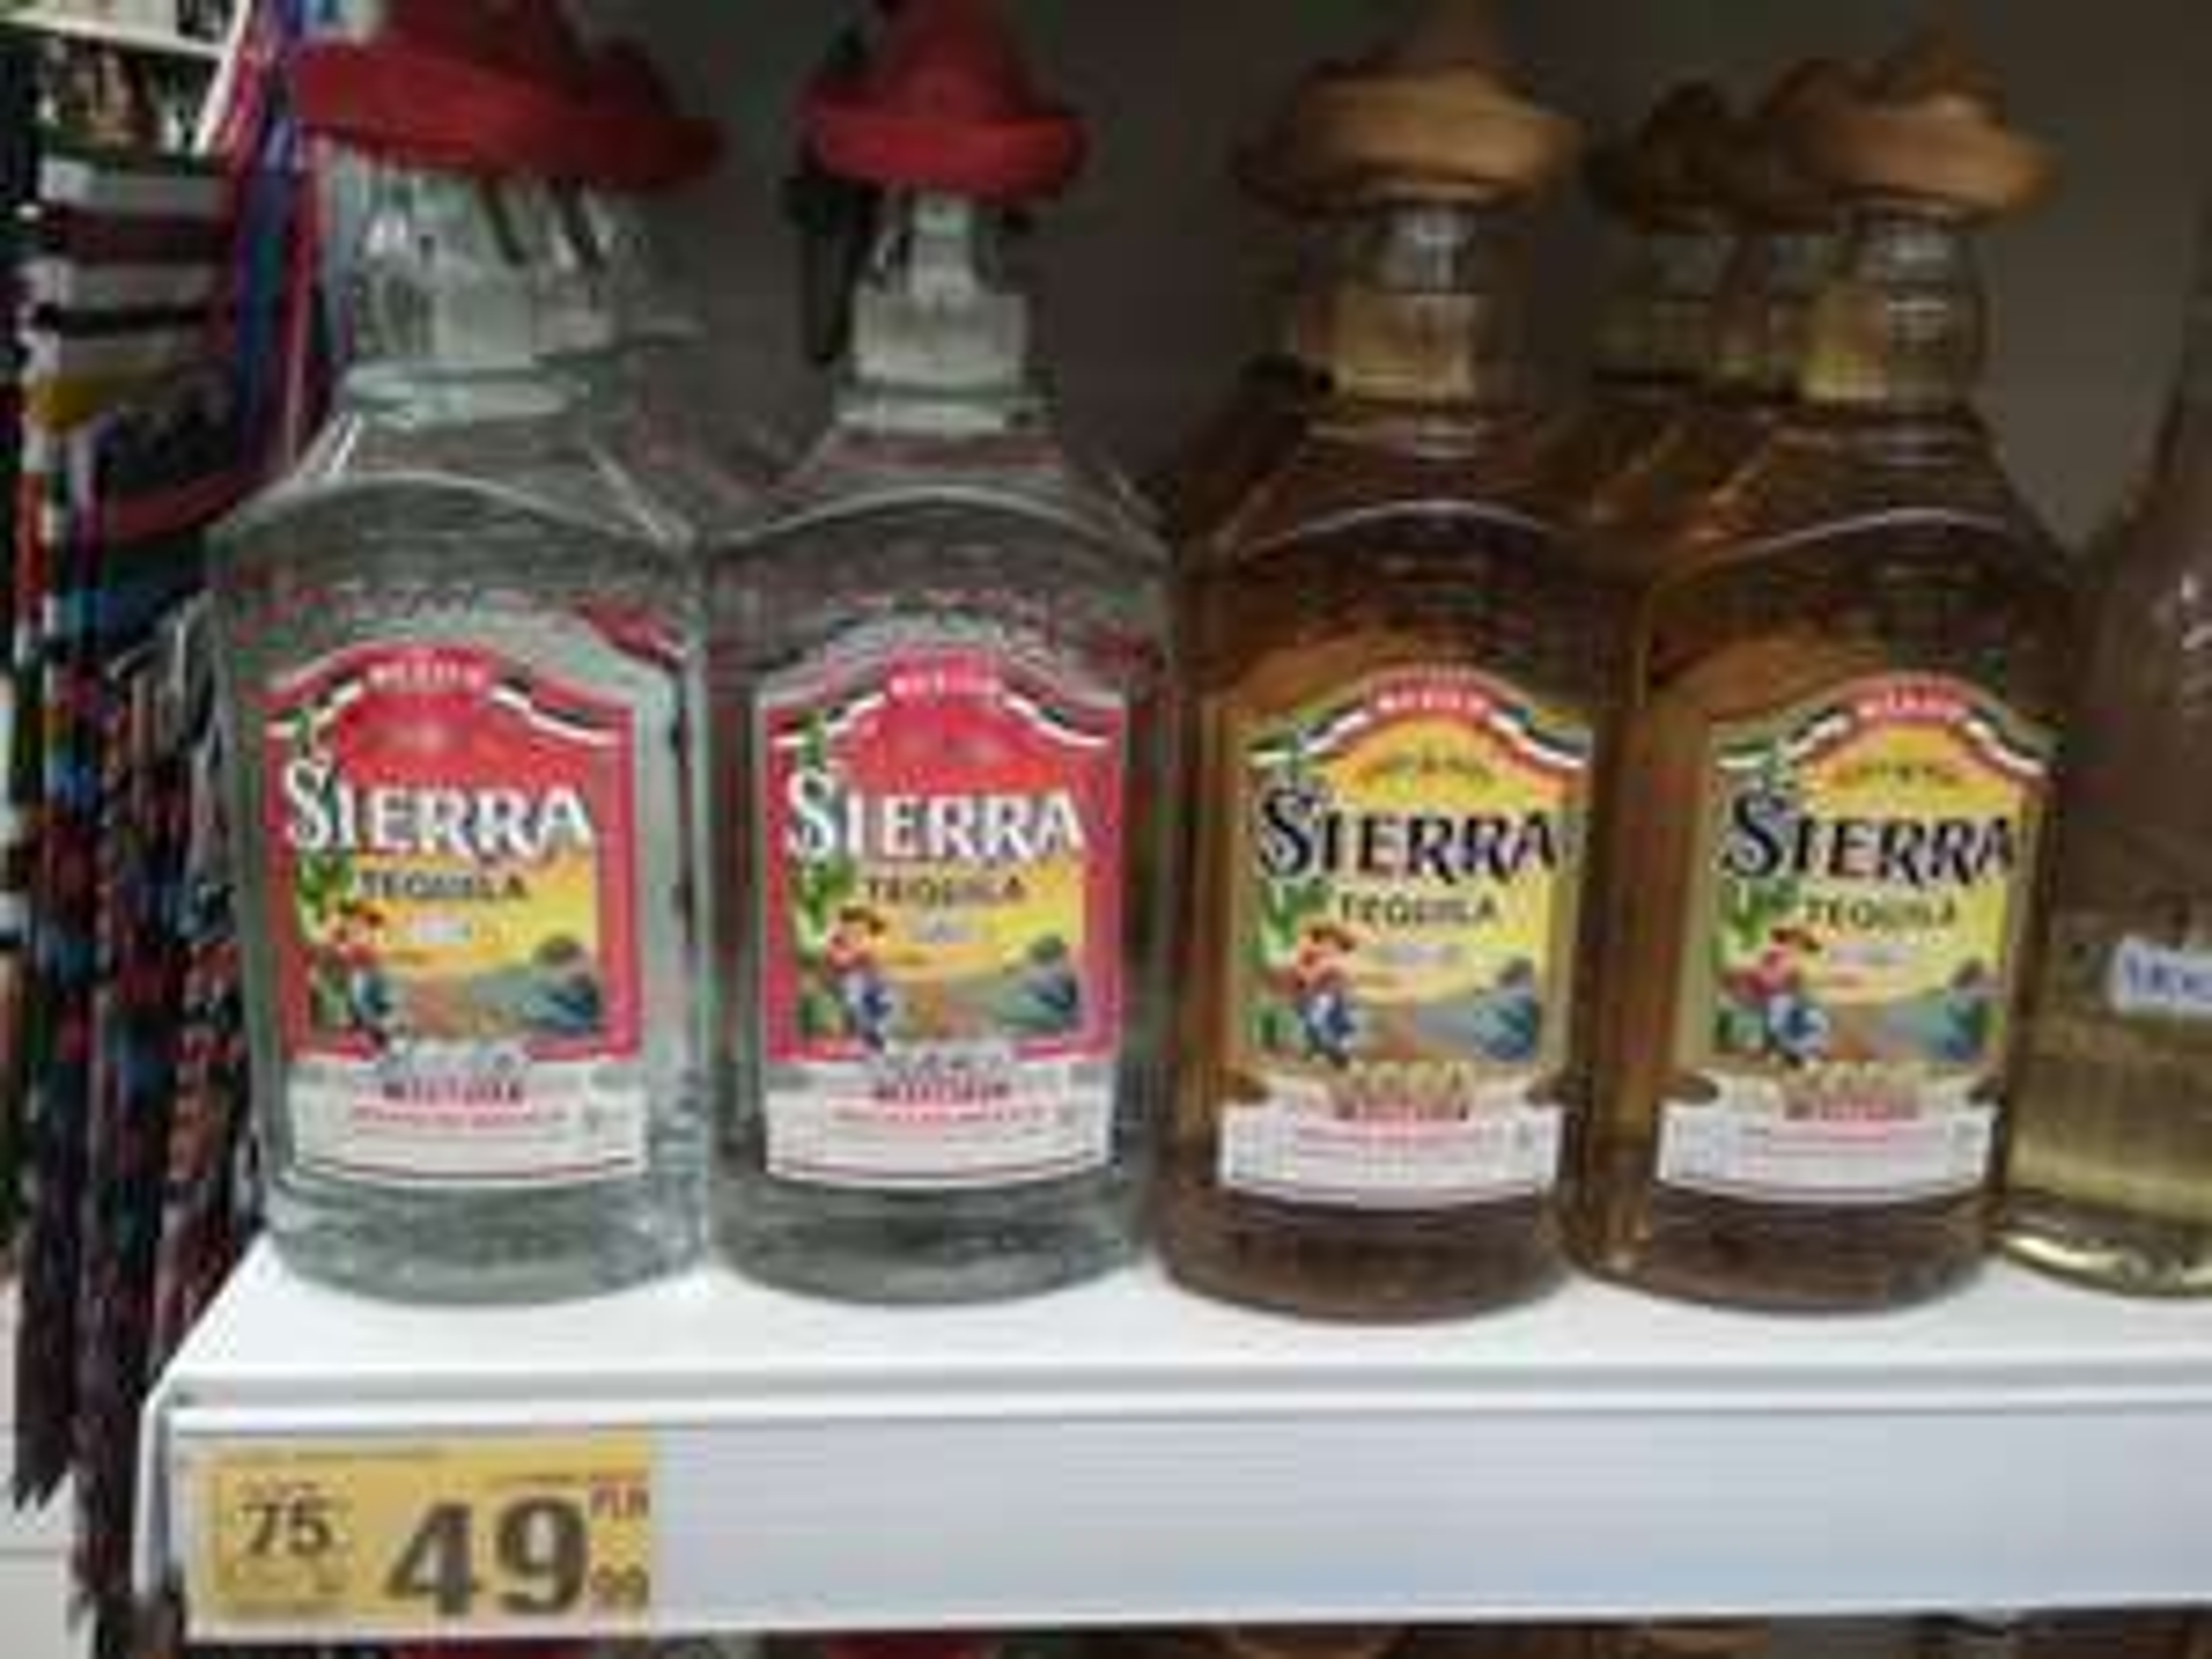 Sierra Tequila silver gold 0.7 Auchan